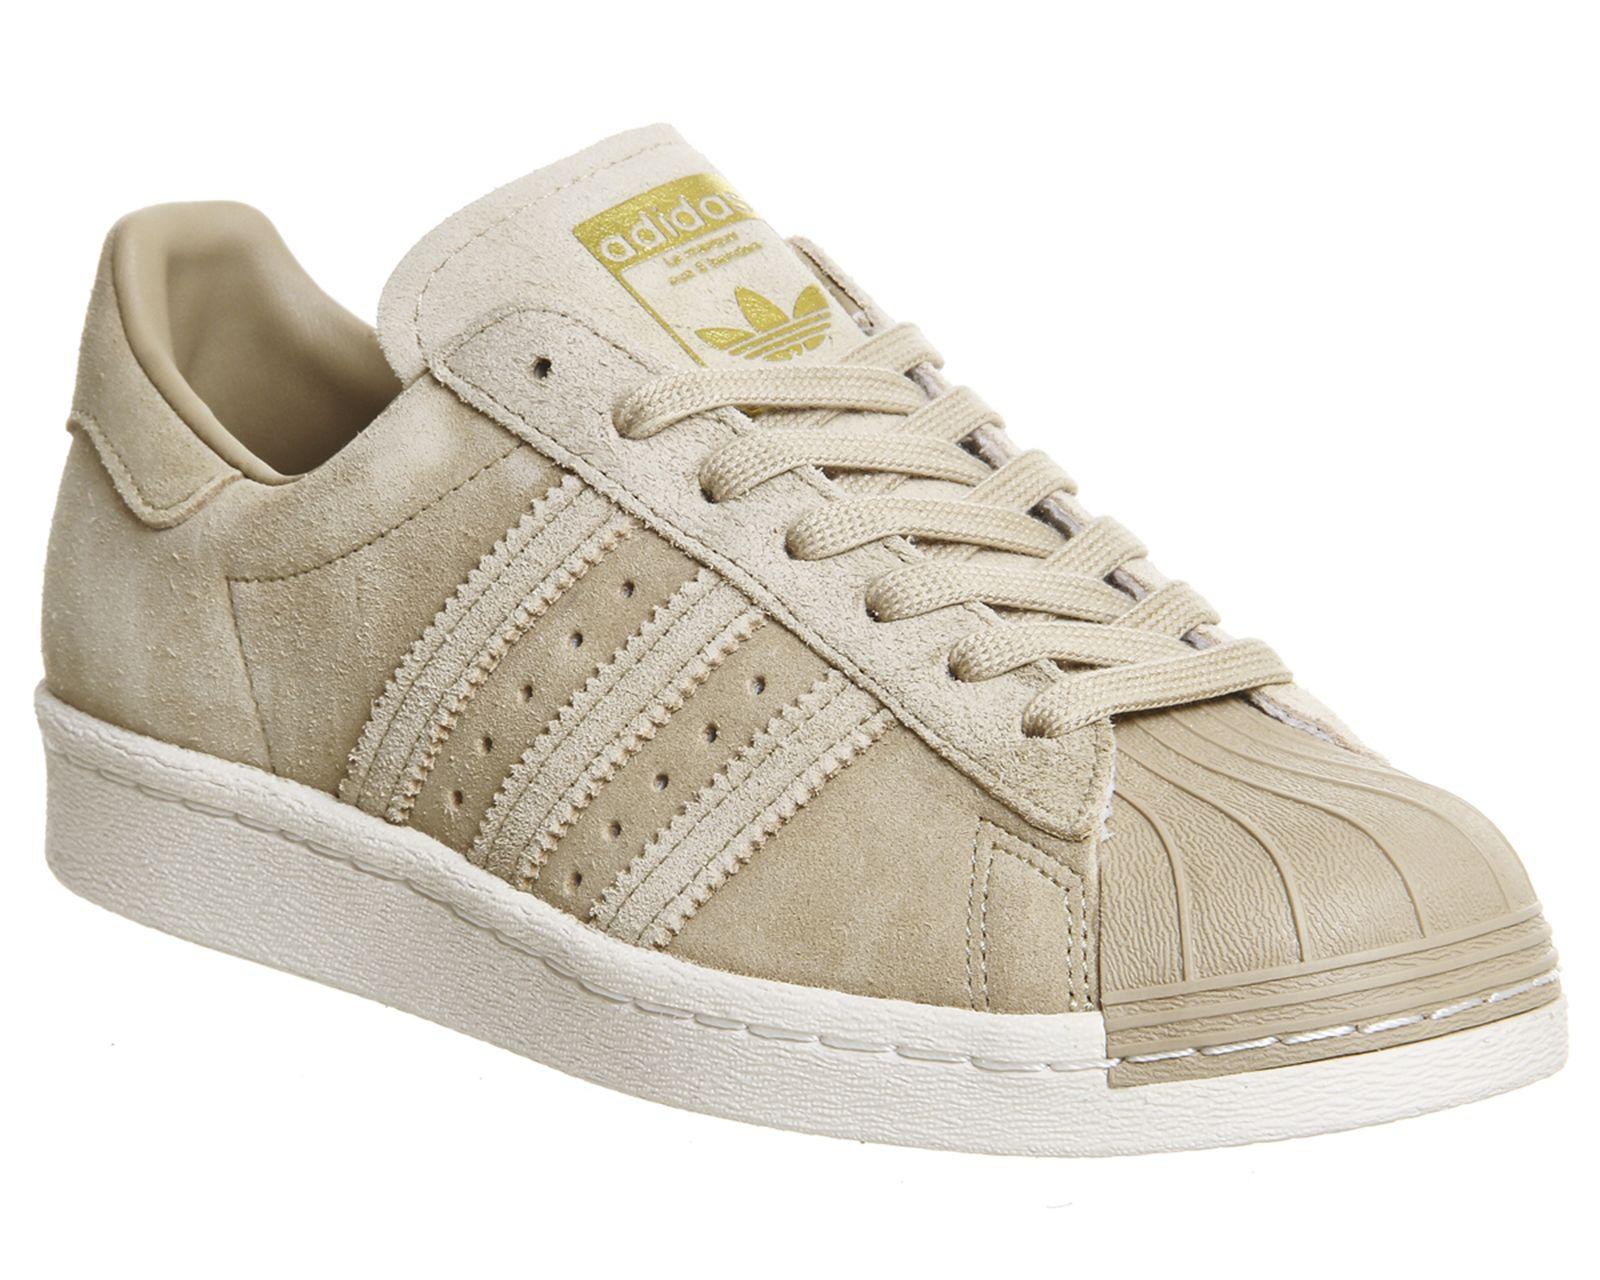 100% authentic 7216b ae5c1 ... Buty Adidas Superstar 80s sneaker freaker It is, ...